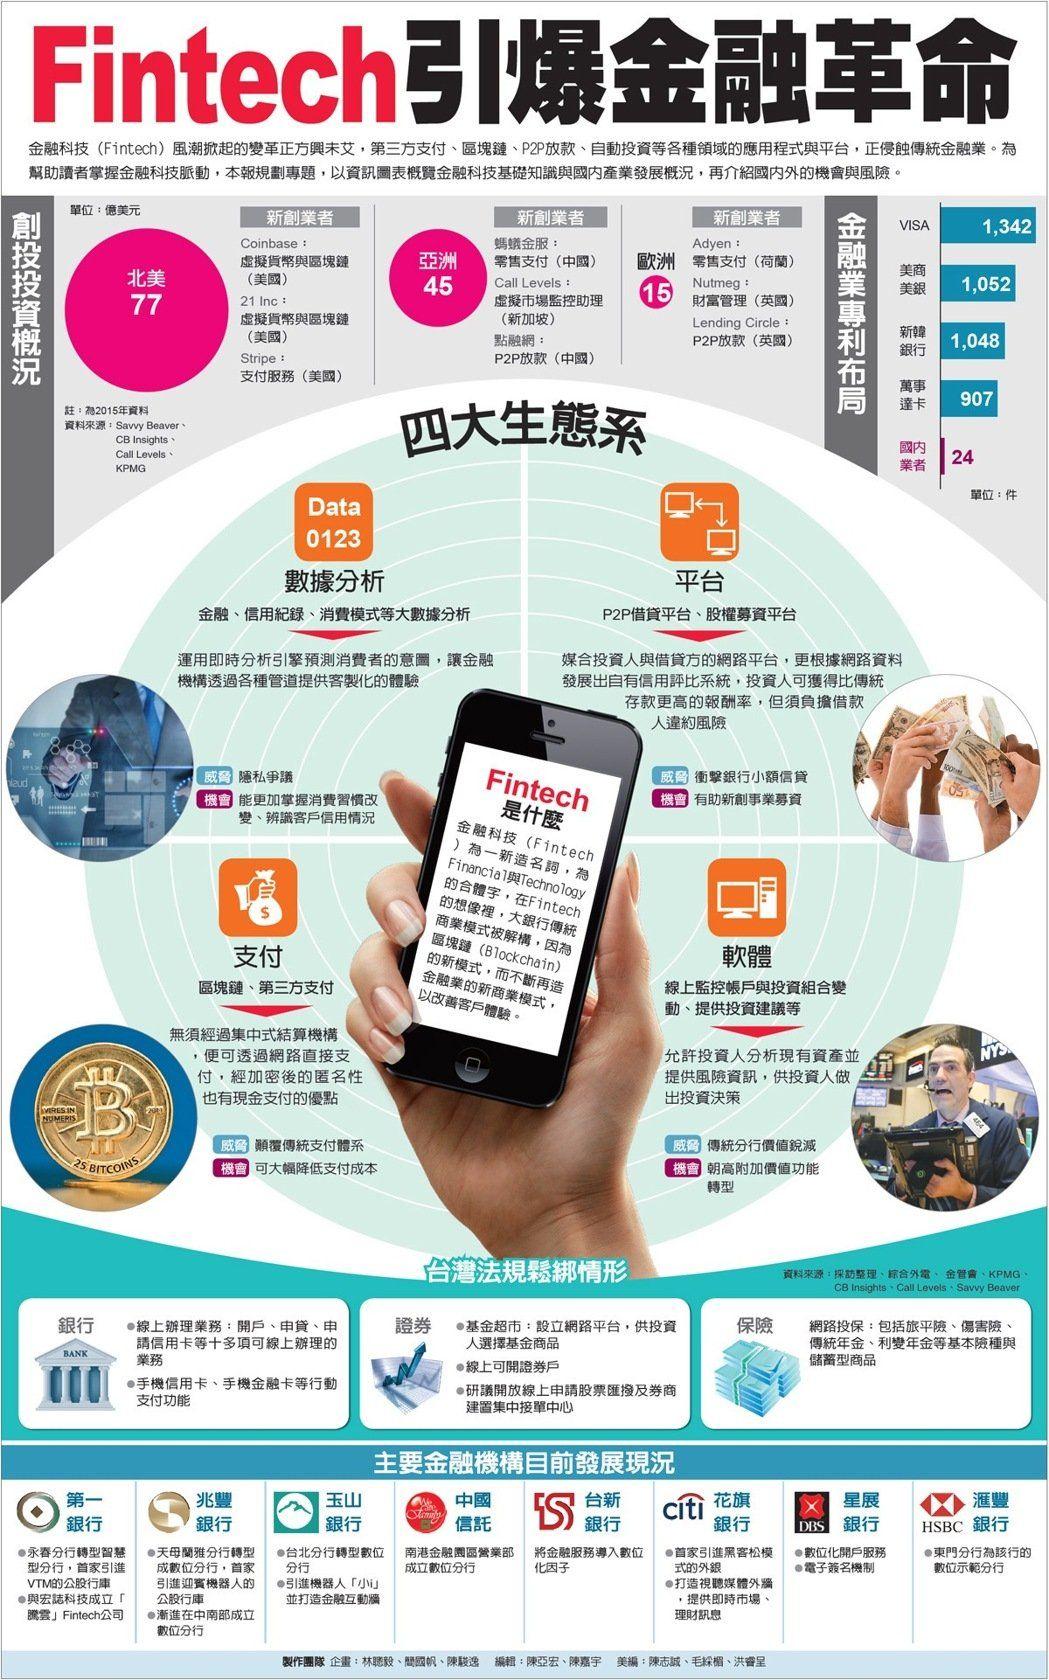 圖/經濟日報提供   Fintech, Story, Ecommerce